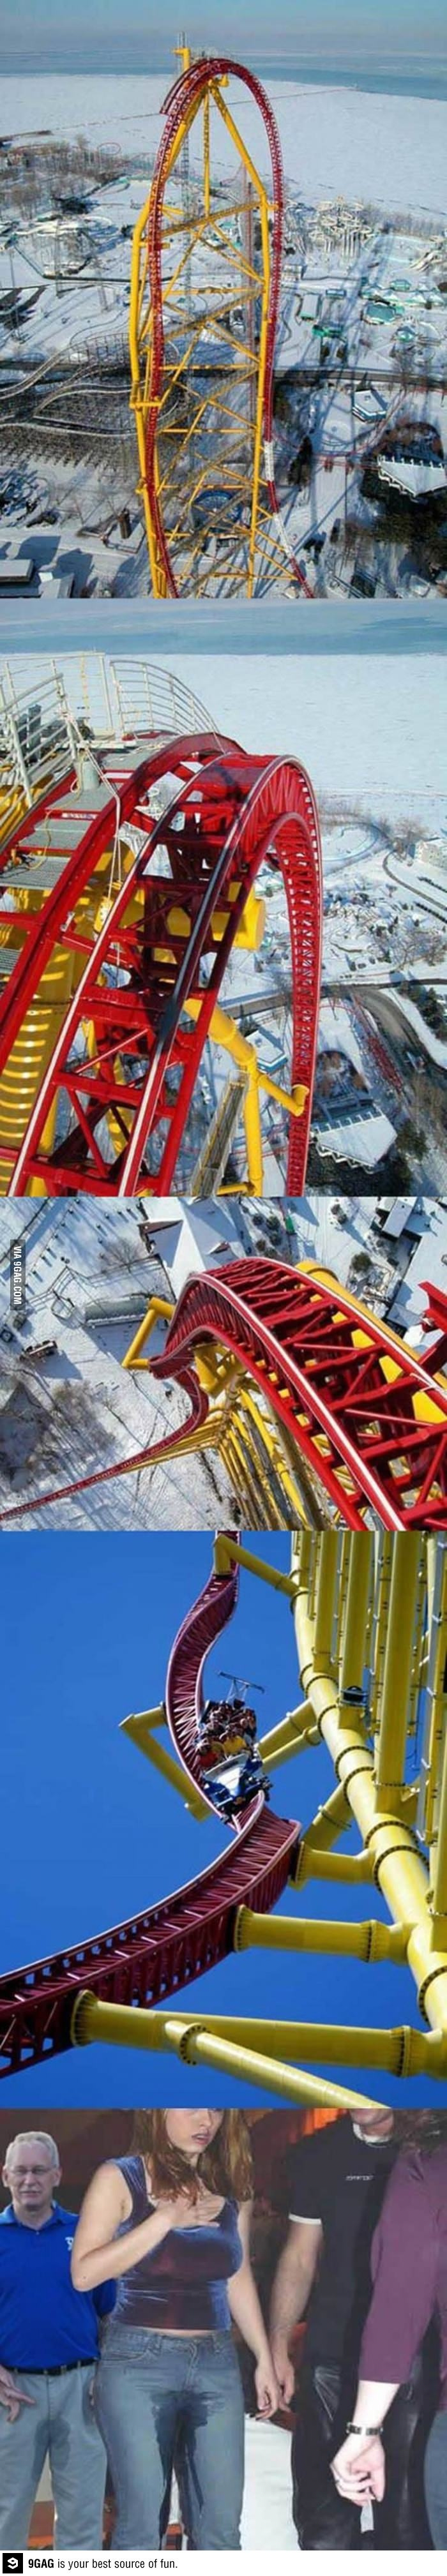 World scariest roller coaster